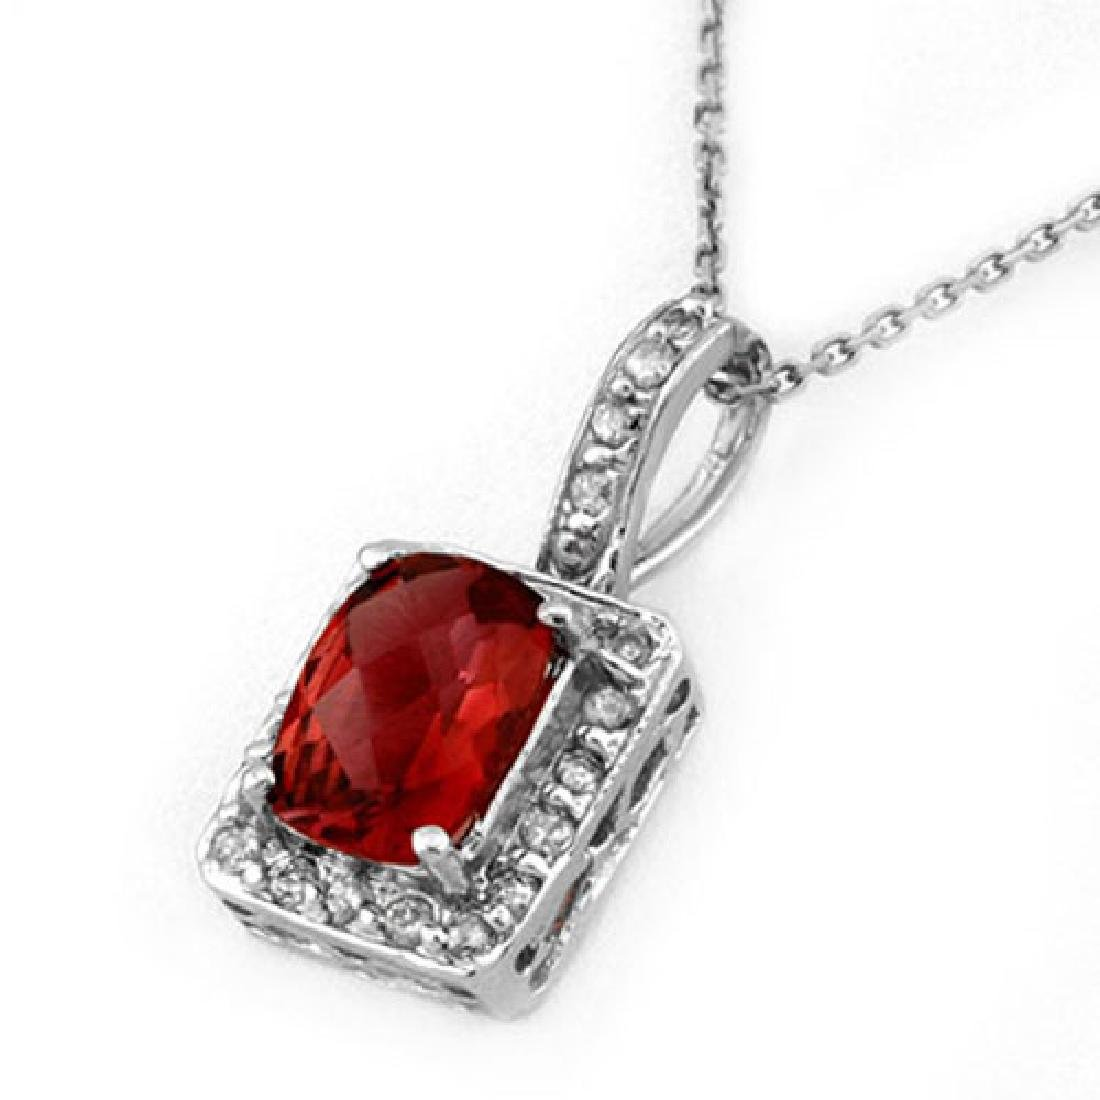 2.25 CTW Pink Tourmaline & Diamond Necklace 14K White